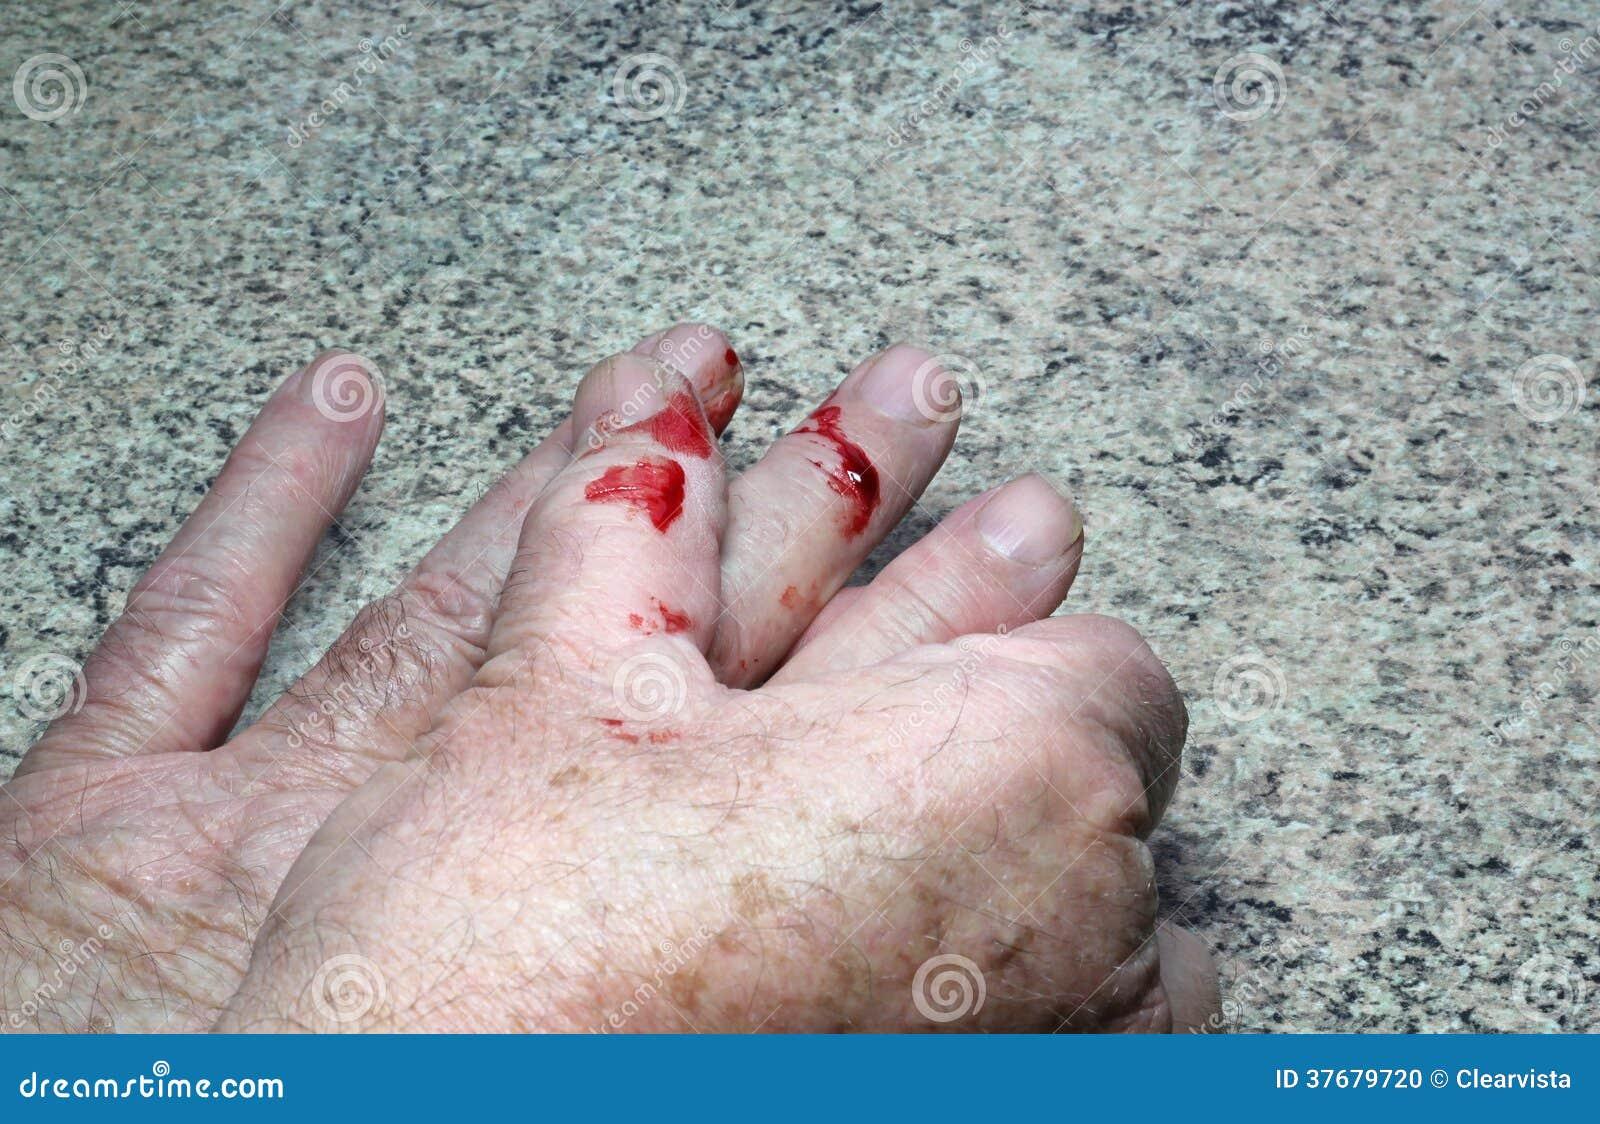 how to stop bleeding cut on finger